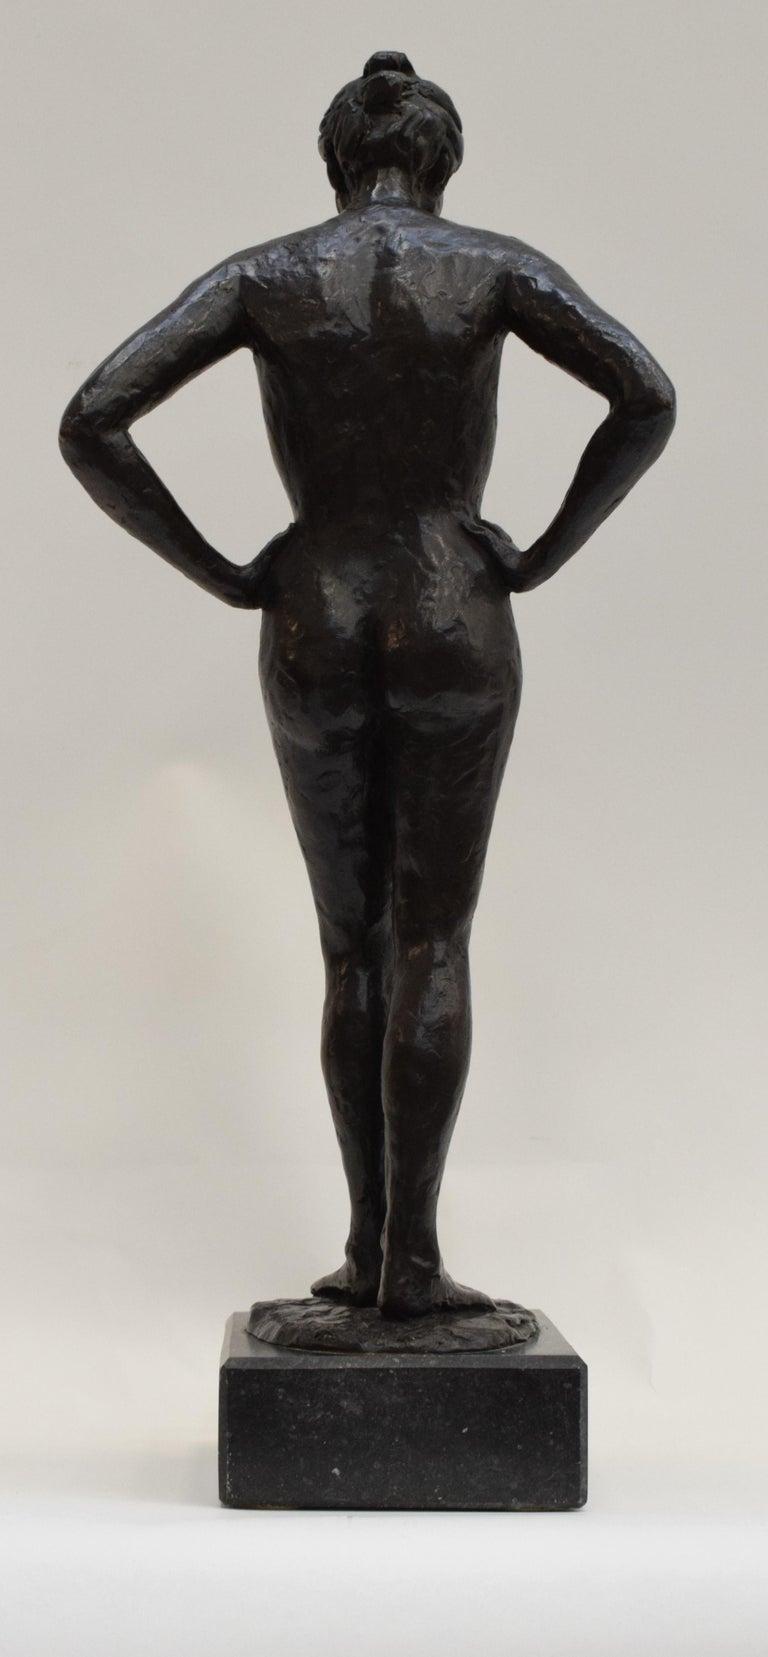 Bronze statue of a woman, Anneke Hei - Degenhardt (1951), Signed - Gold Figurative Sculpture by Anneke Hei-Degenhardt